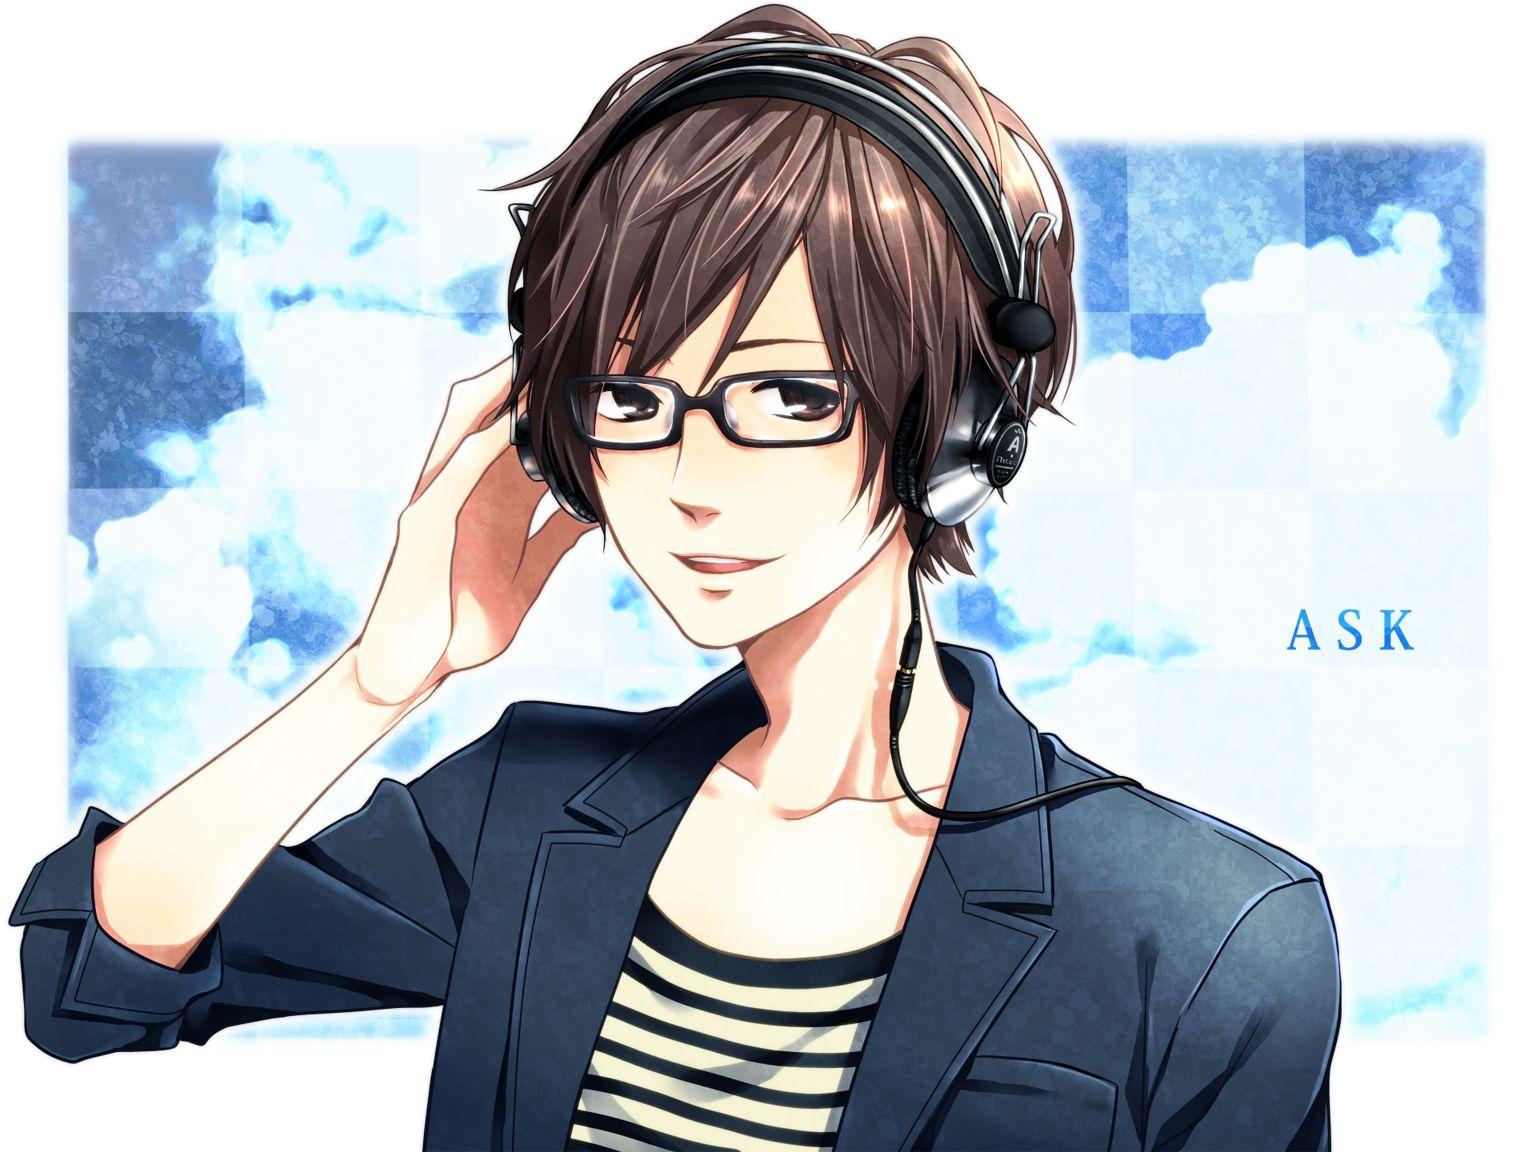 Похожее изображение Anime glasses boy, Anime guys with